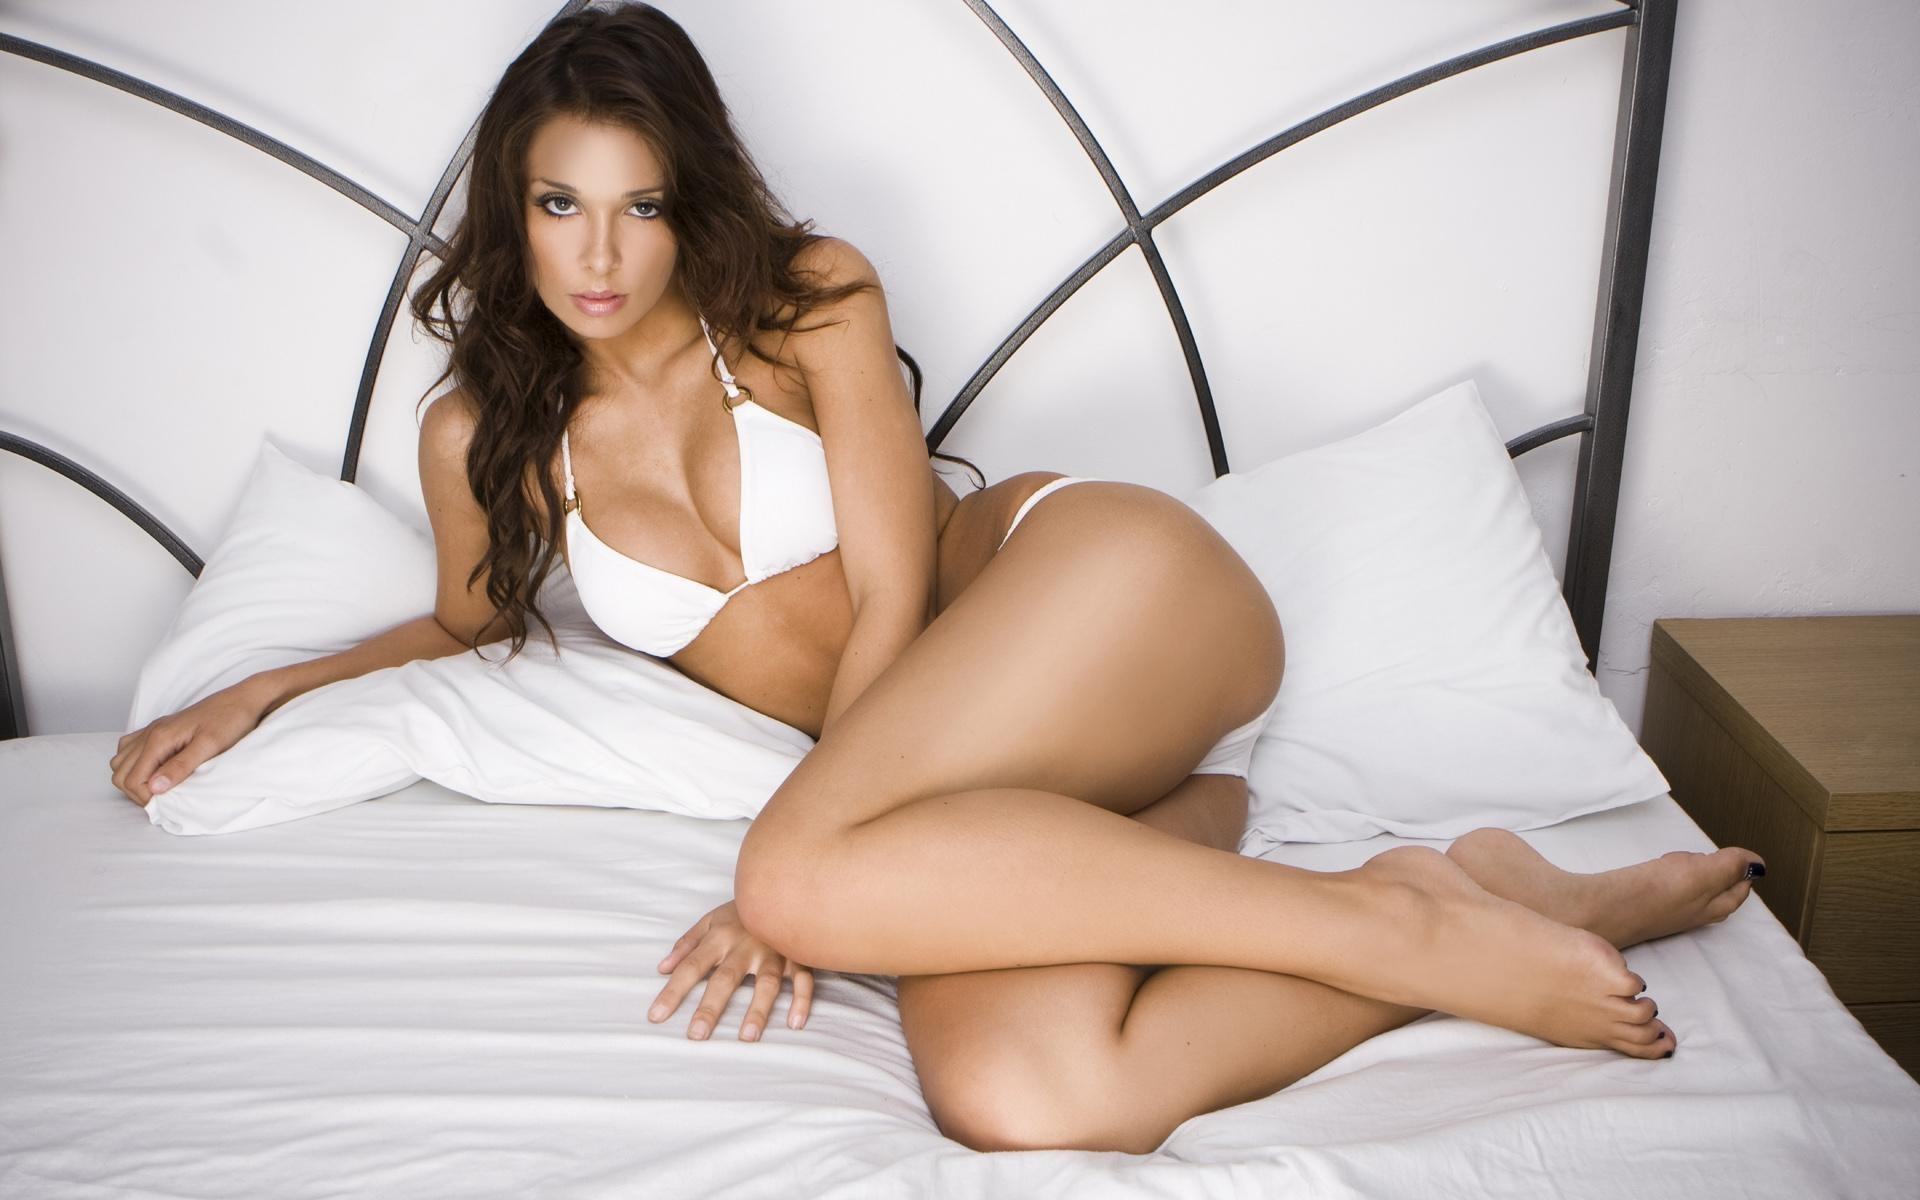 Tonya sexy mature pictures